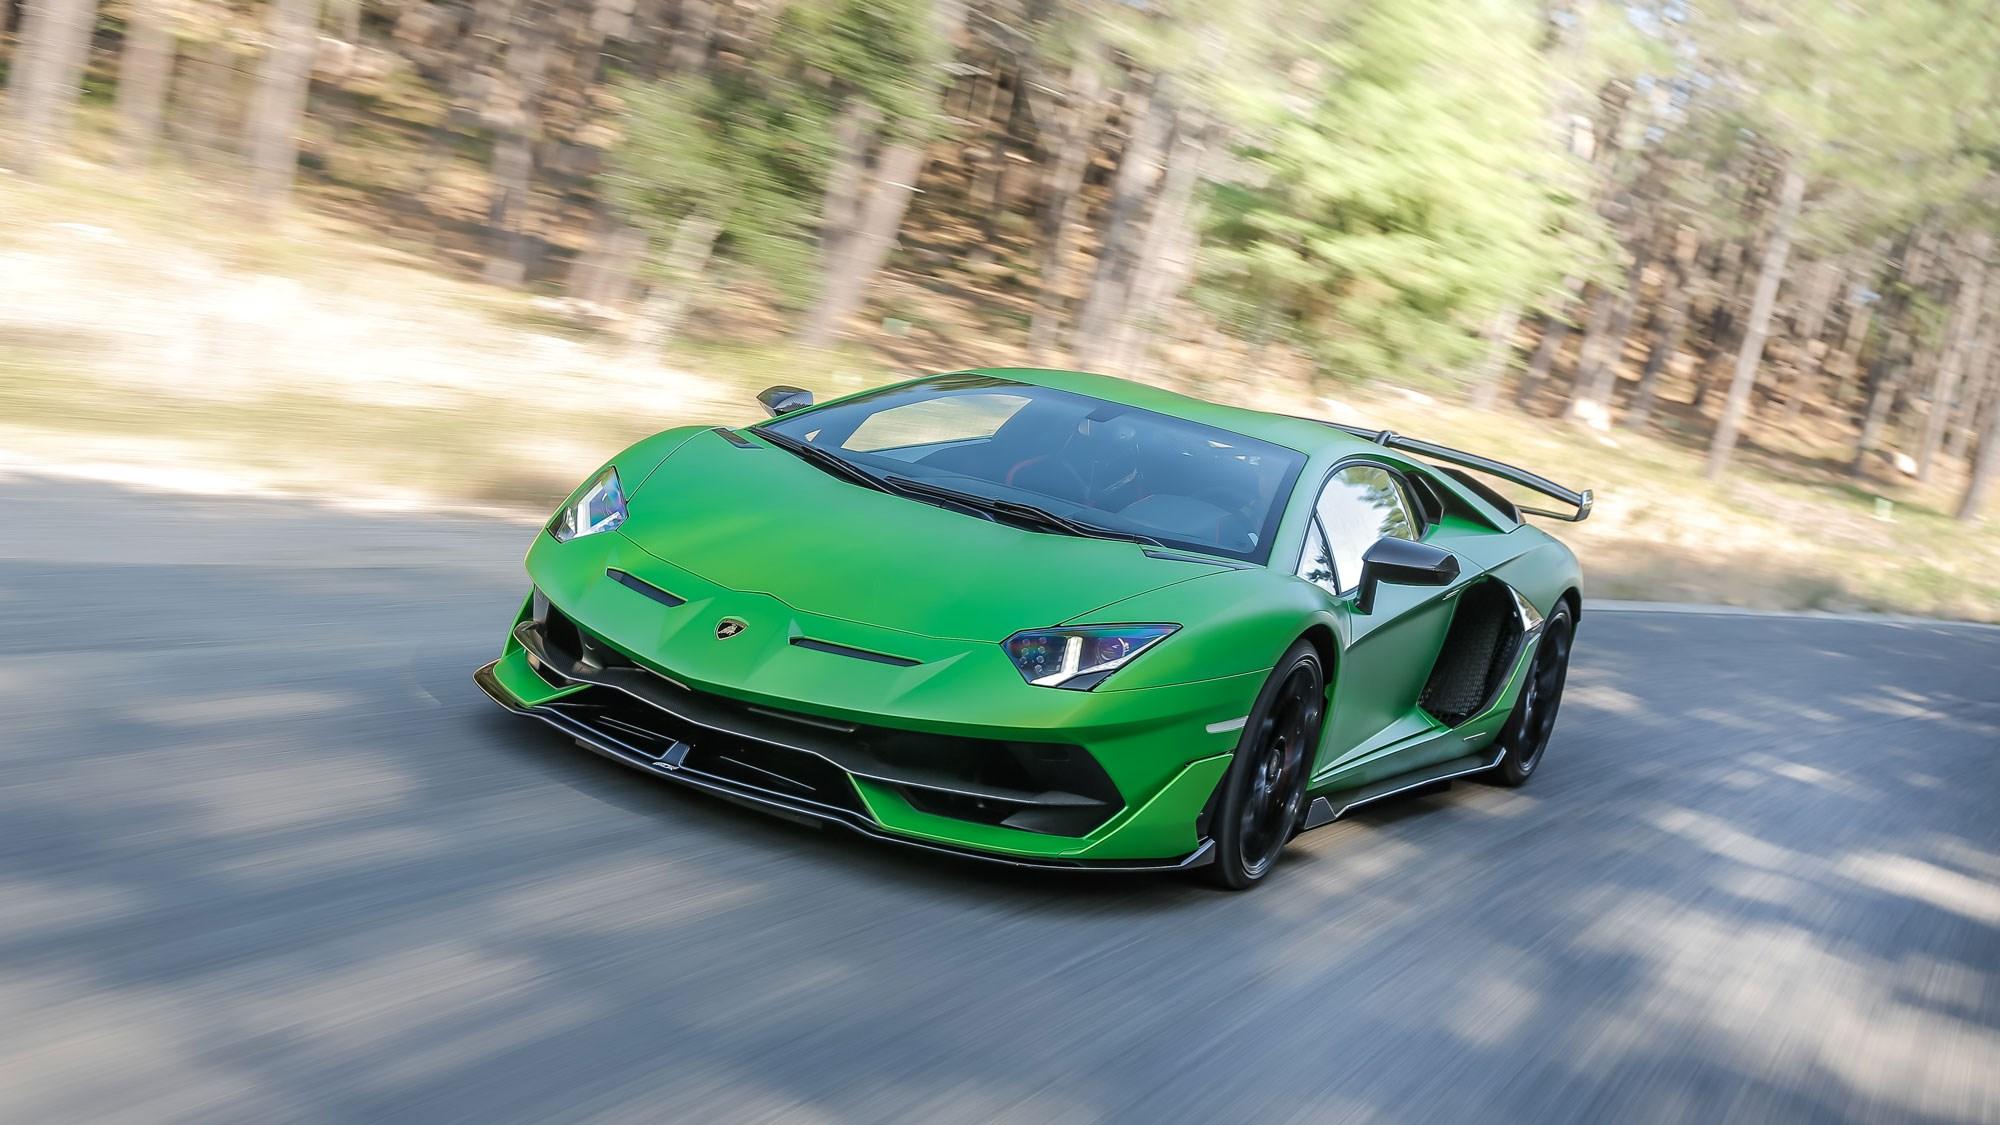 Audi Lease Deals >> Lamborghini Aventador SVJ review: truly special   CAR Magazine